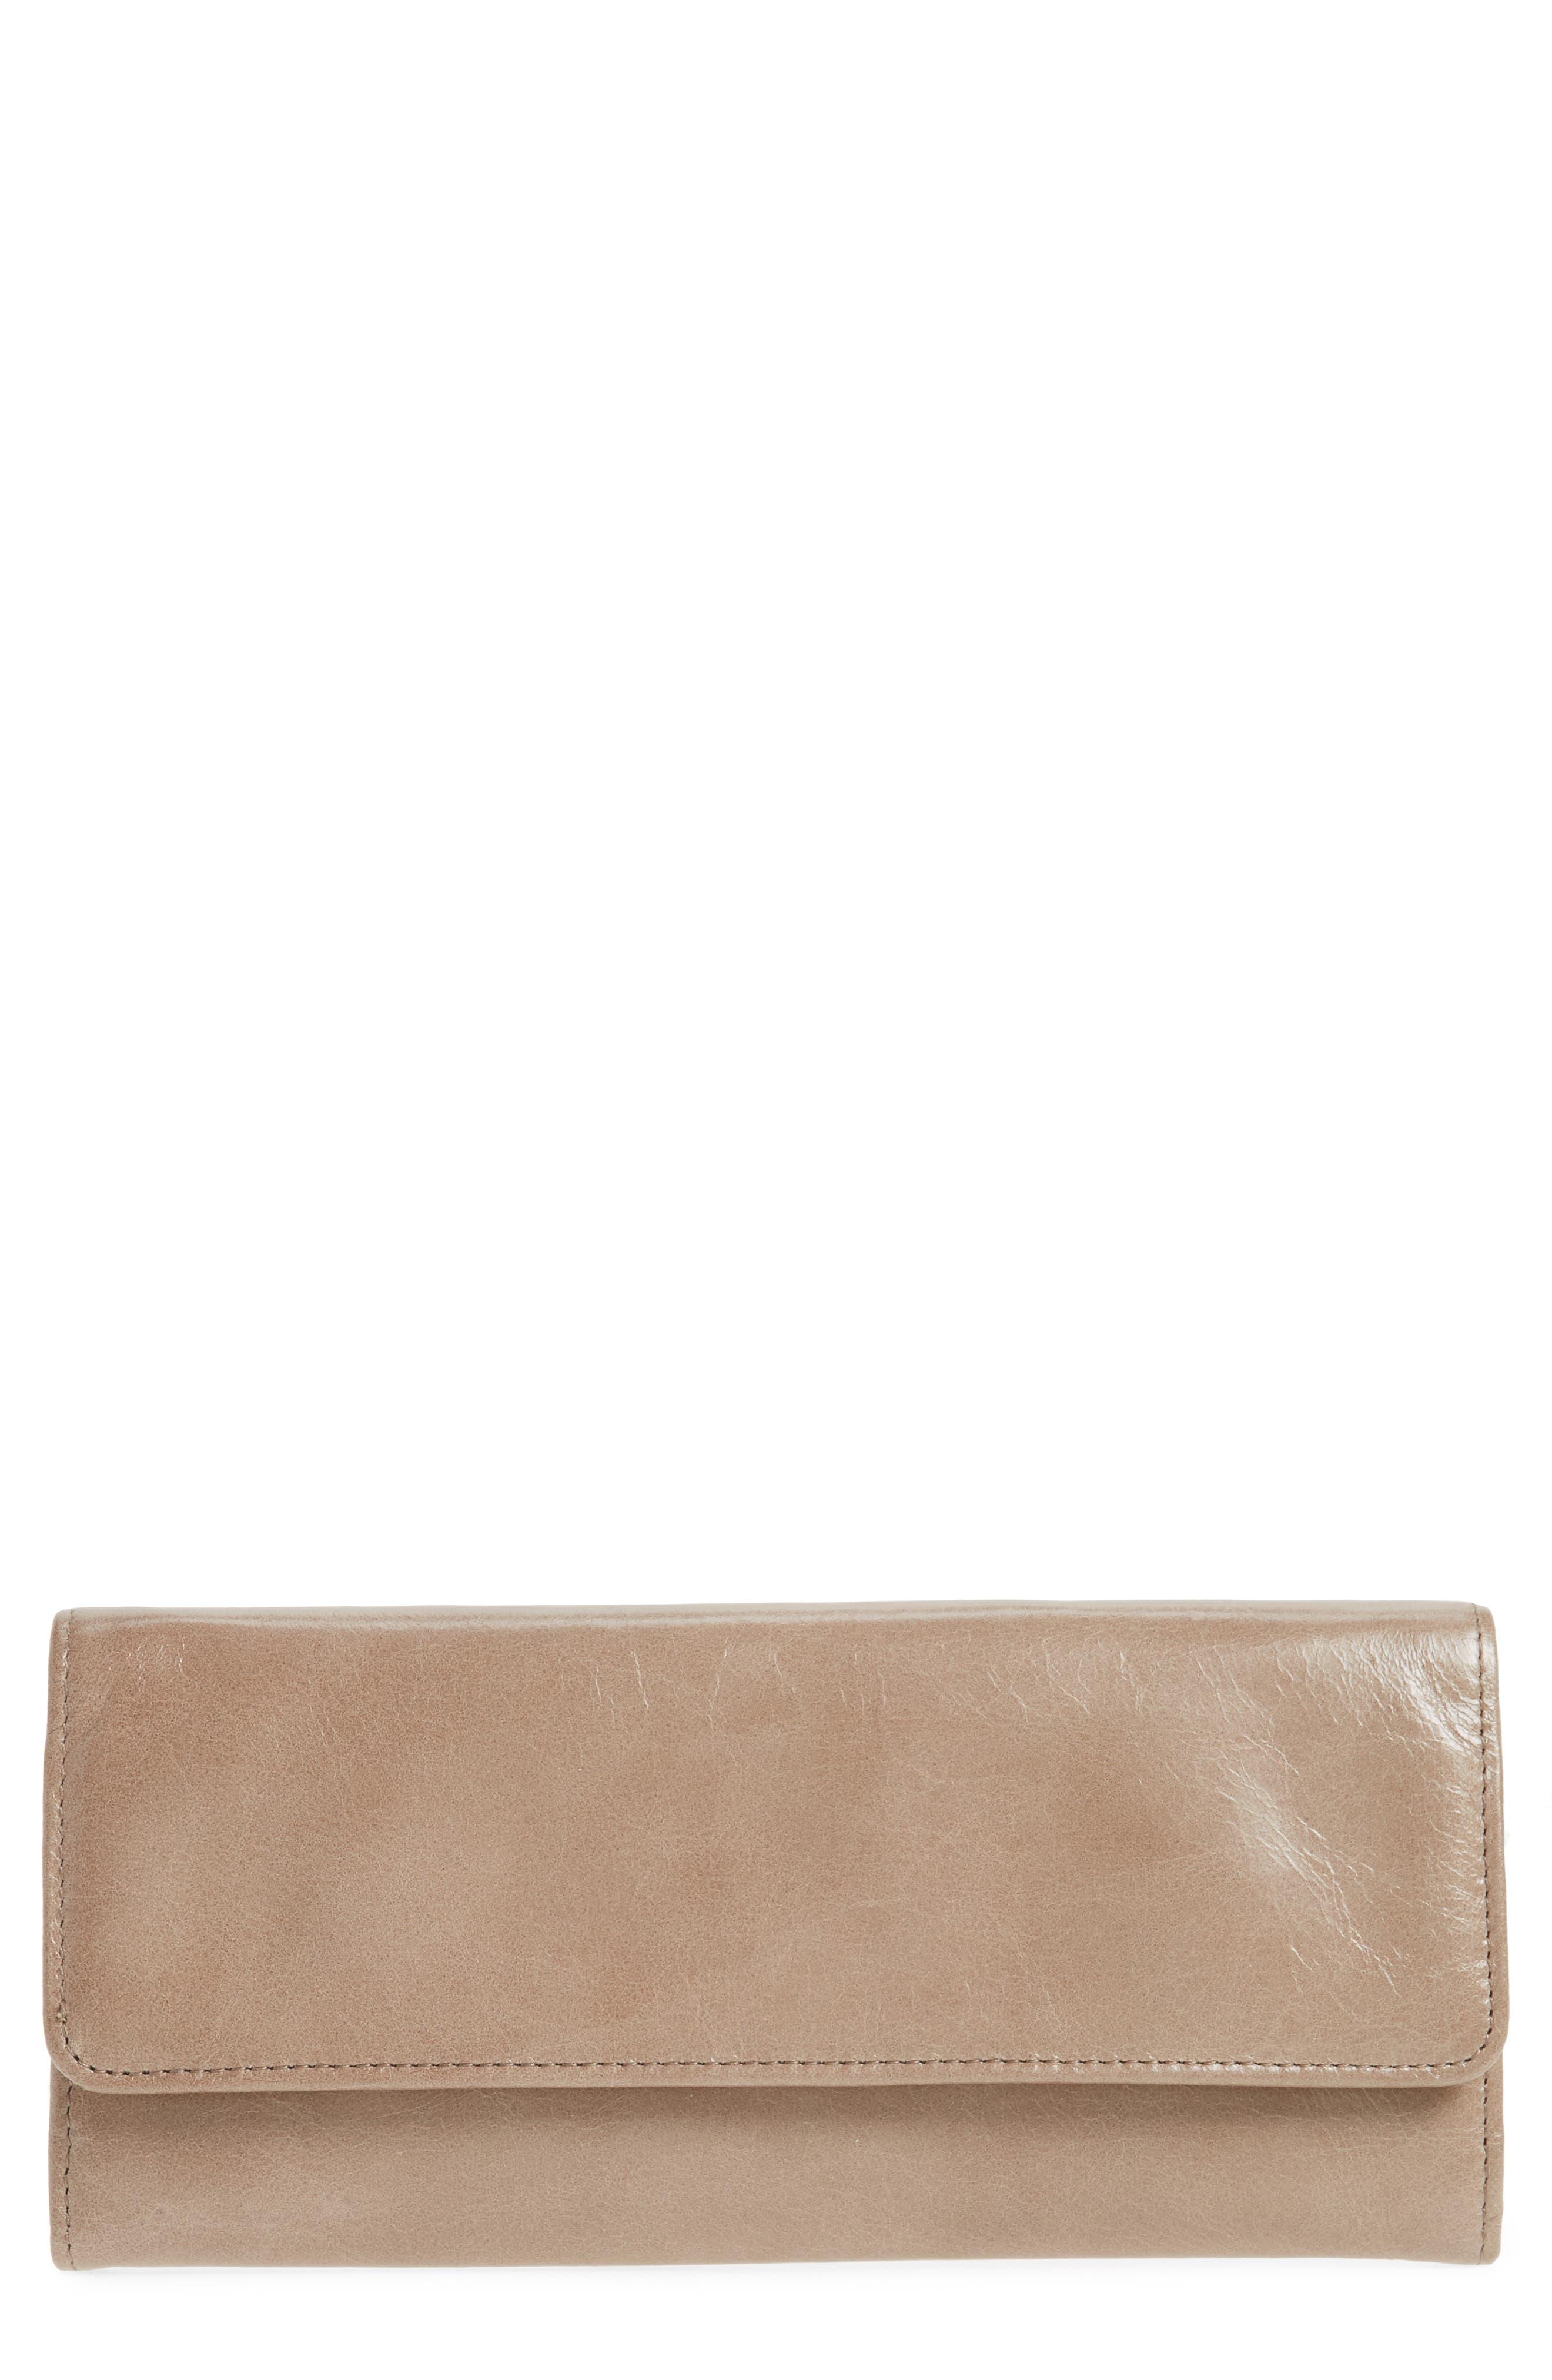 'Sadie' Leather Wallet,                         Main,                         color,